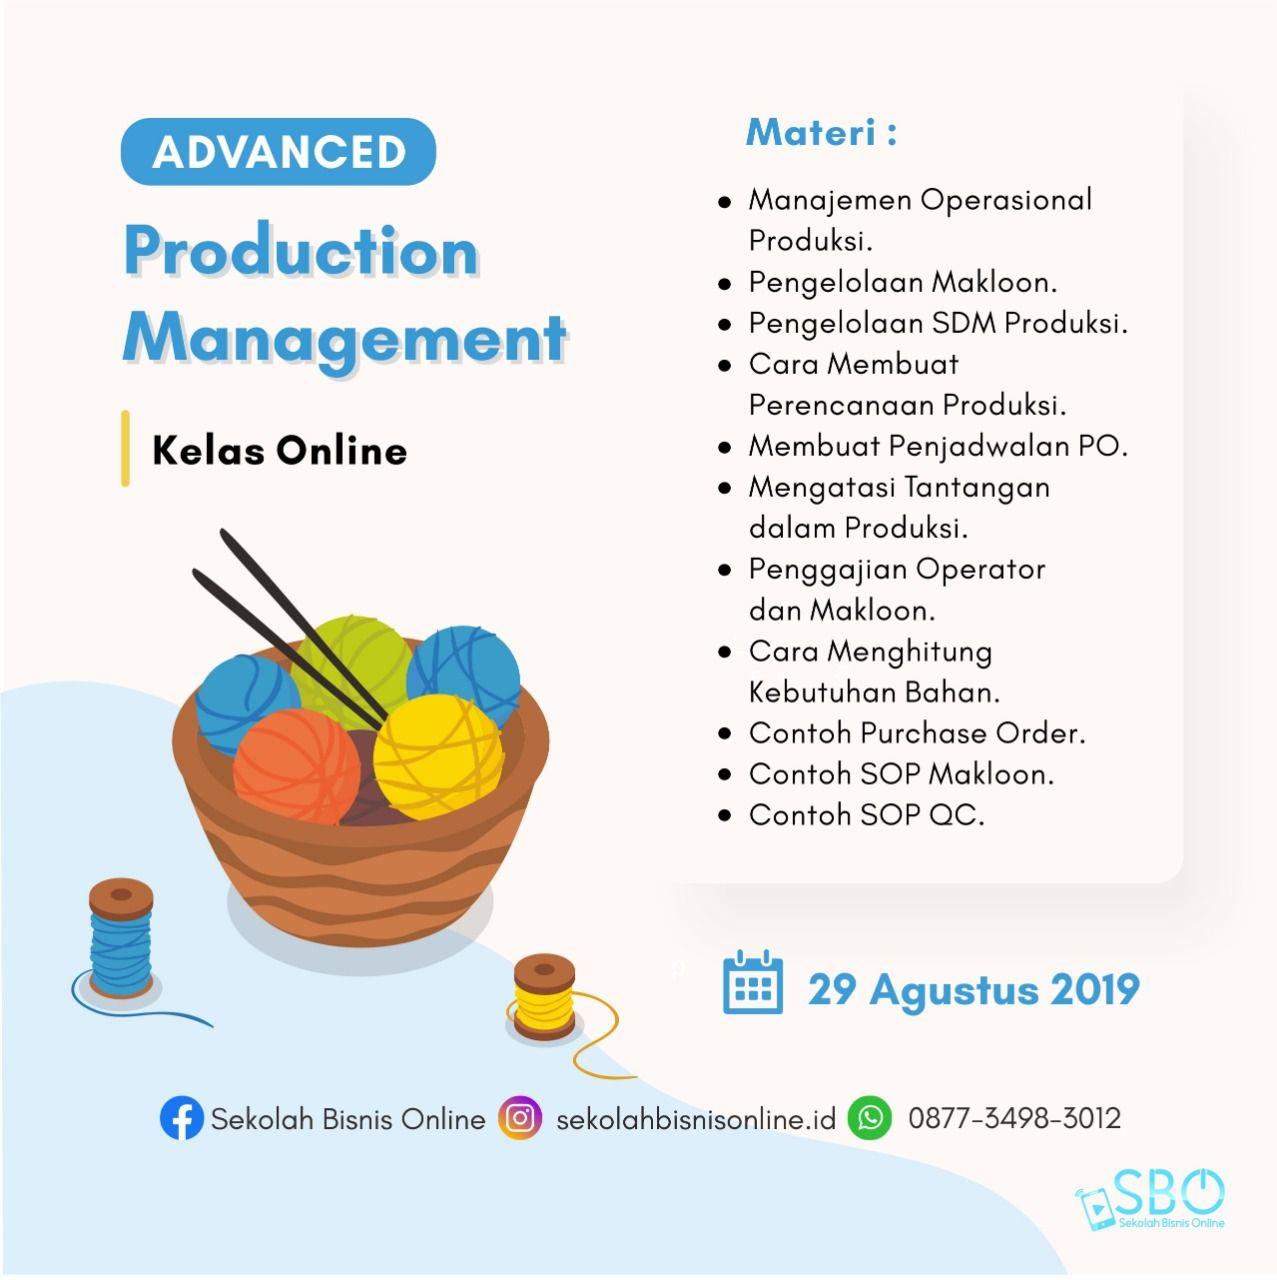 Manajemen Produksi Media Manajemen Produksi Adalah Manajemen Pemasaran Produksi Massal Production Management System Production Management P Messages Online